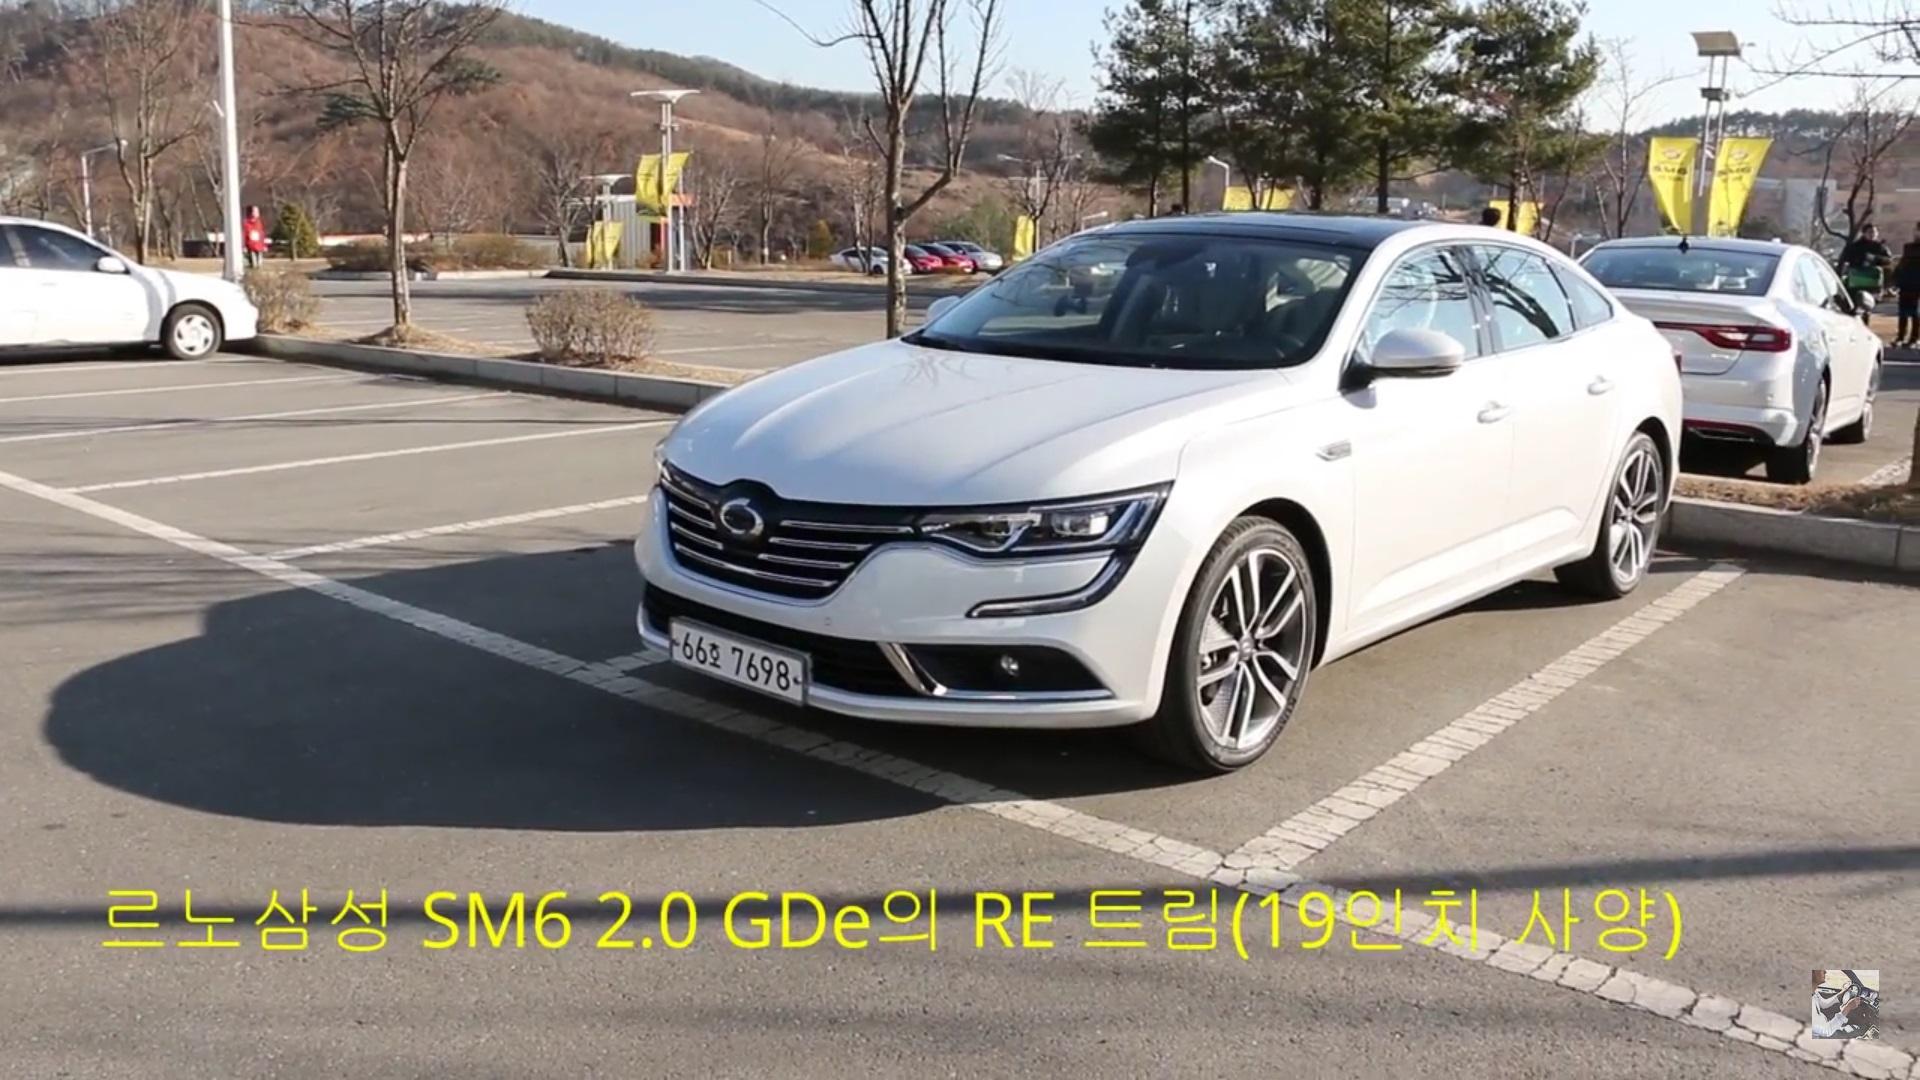 Renault Samsung Unveils Sm6 Talisman In Korea Gets 2 0